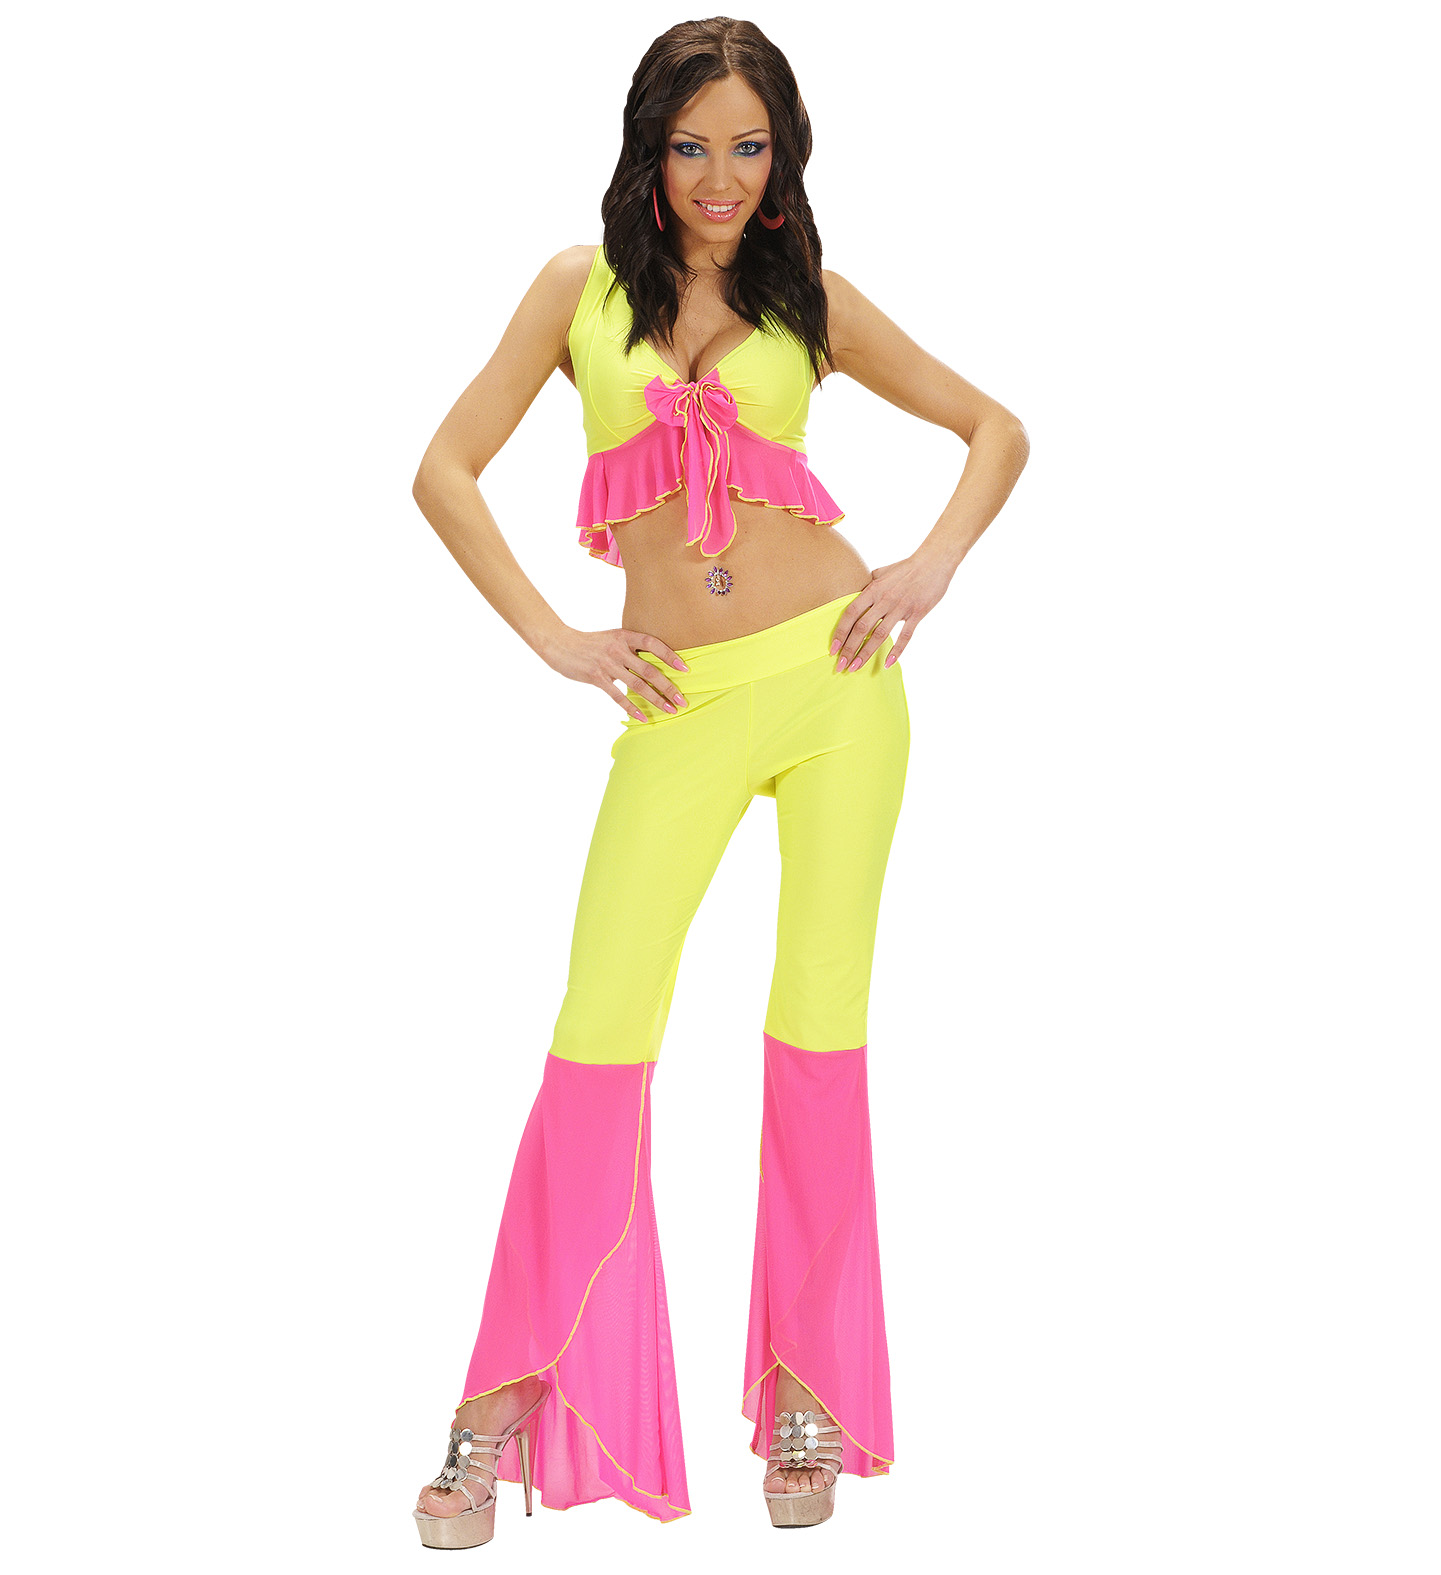 Mens Samba Top & Pants Neon Yellow & Pink Costume Fancy Dress